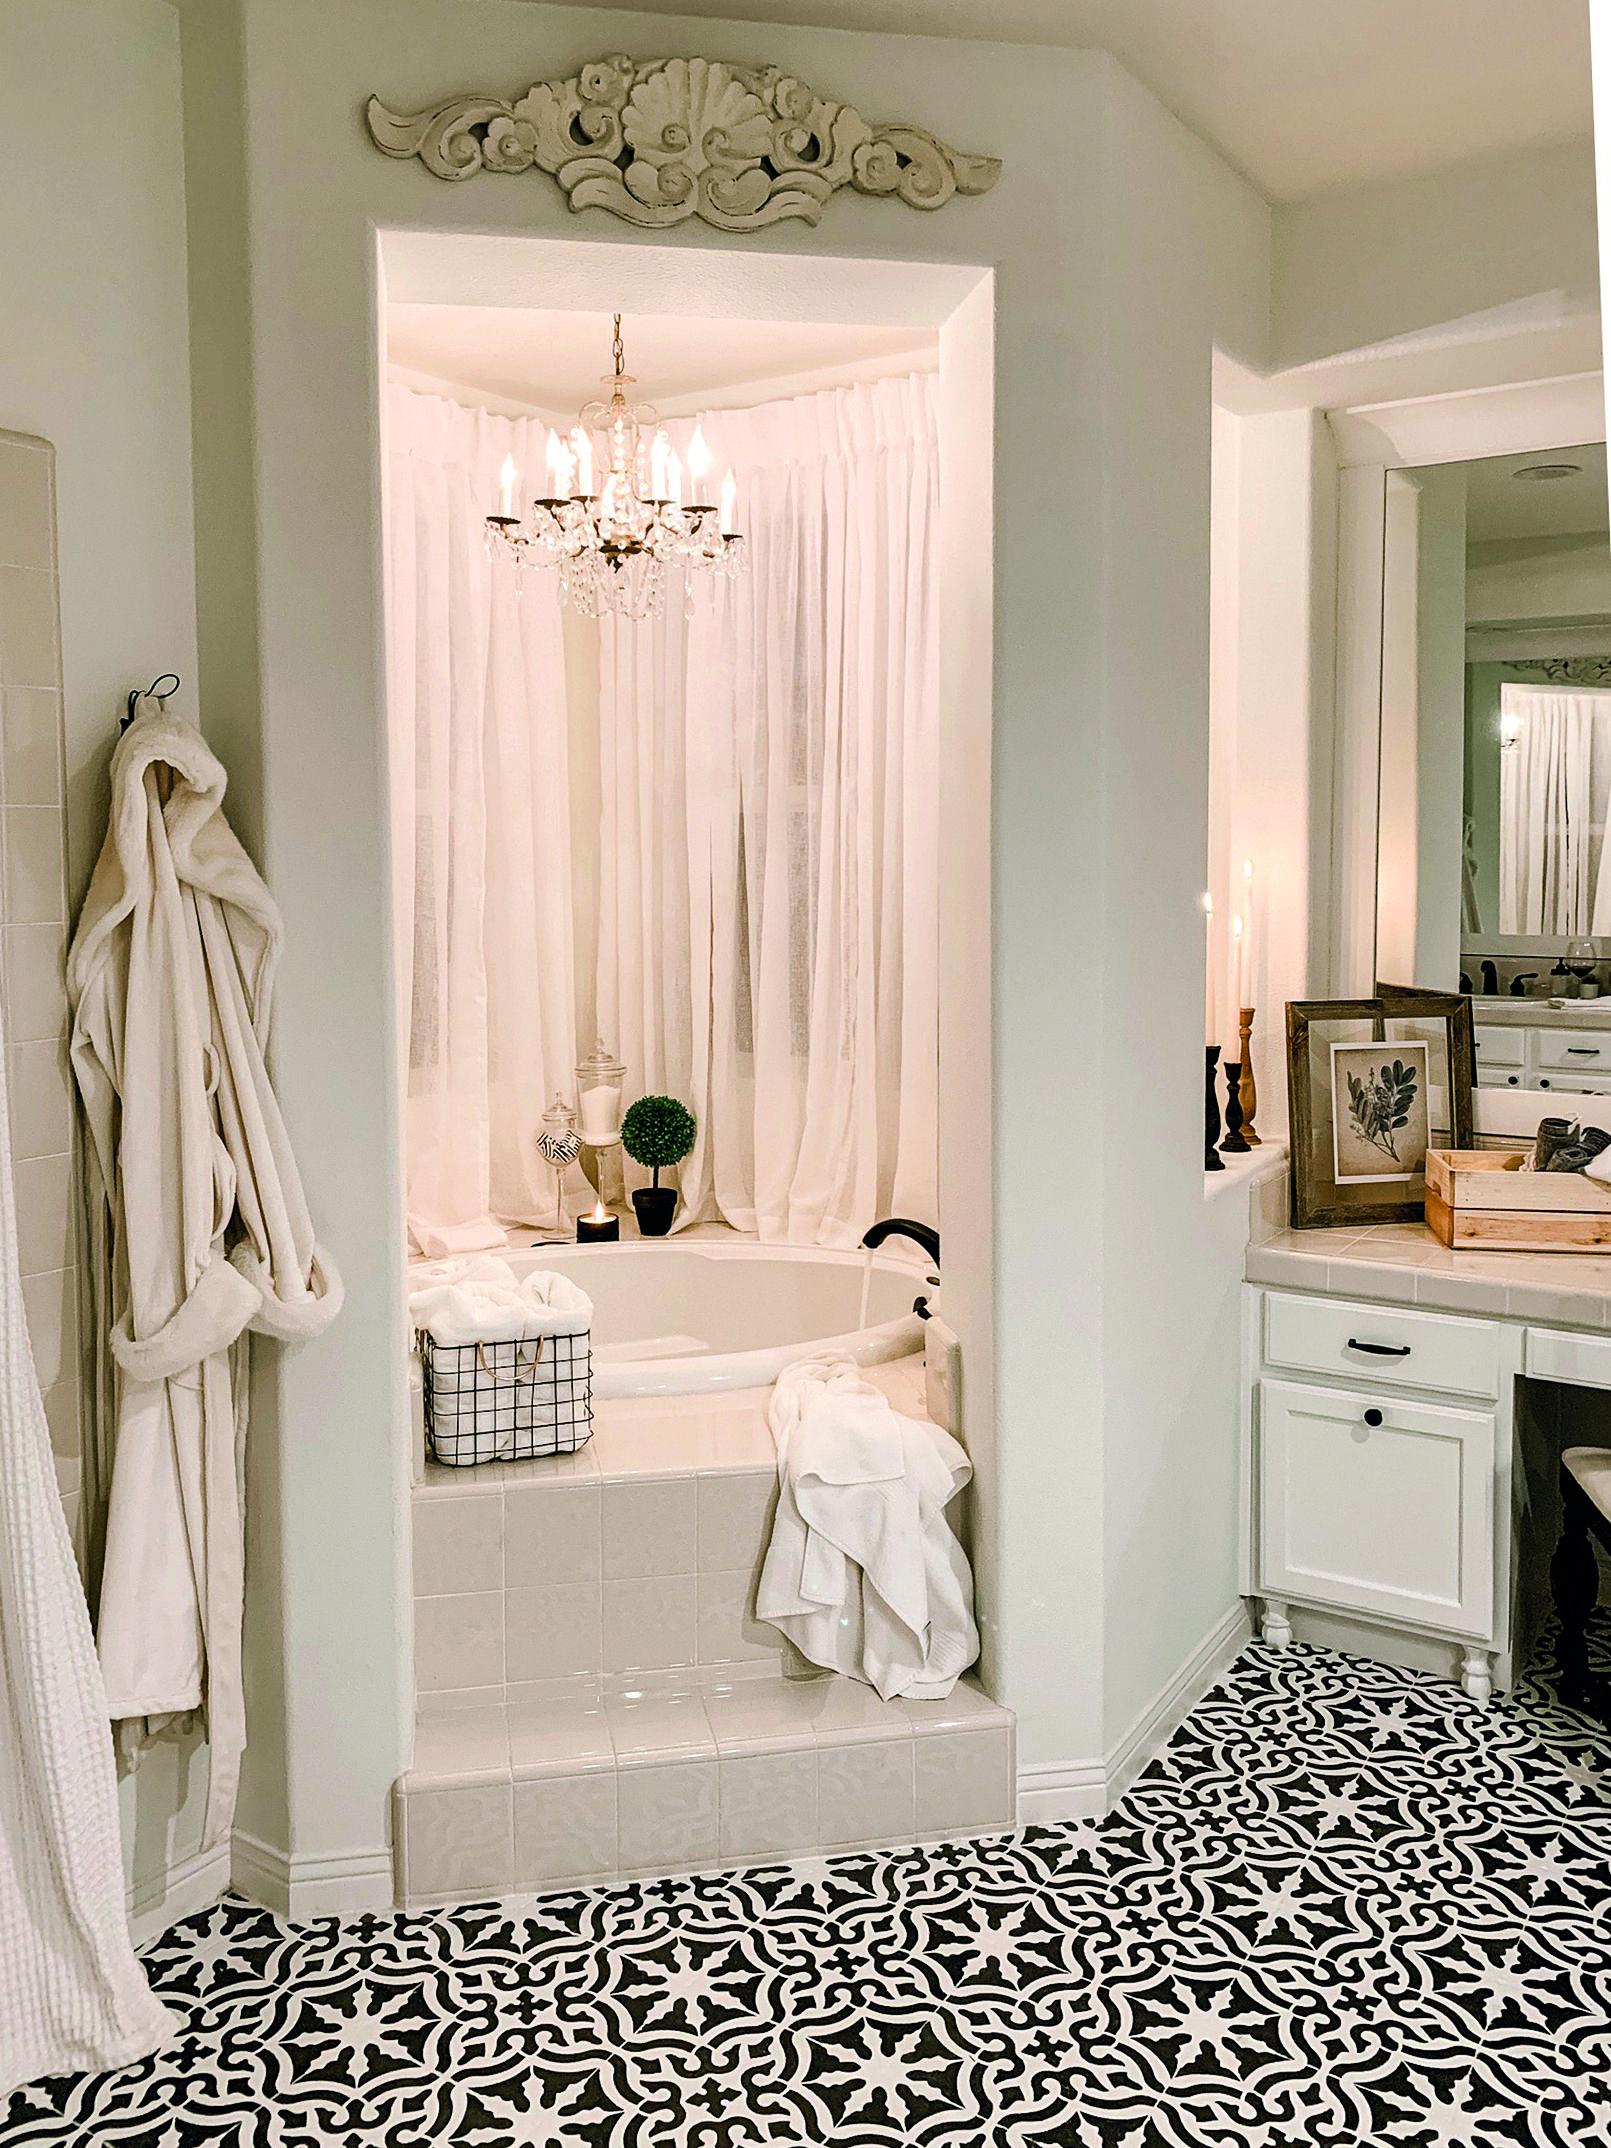 How To Stencil Travertine Floors Jaclyn James Company Painted Bathroom Floors Painting Bathroom Tiles Painting Tile